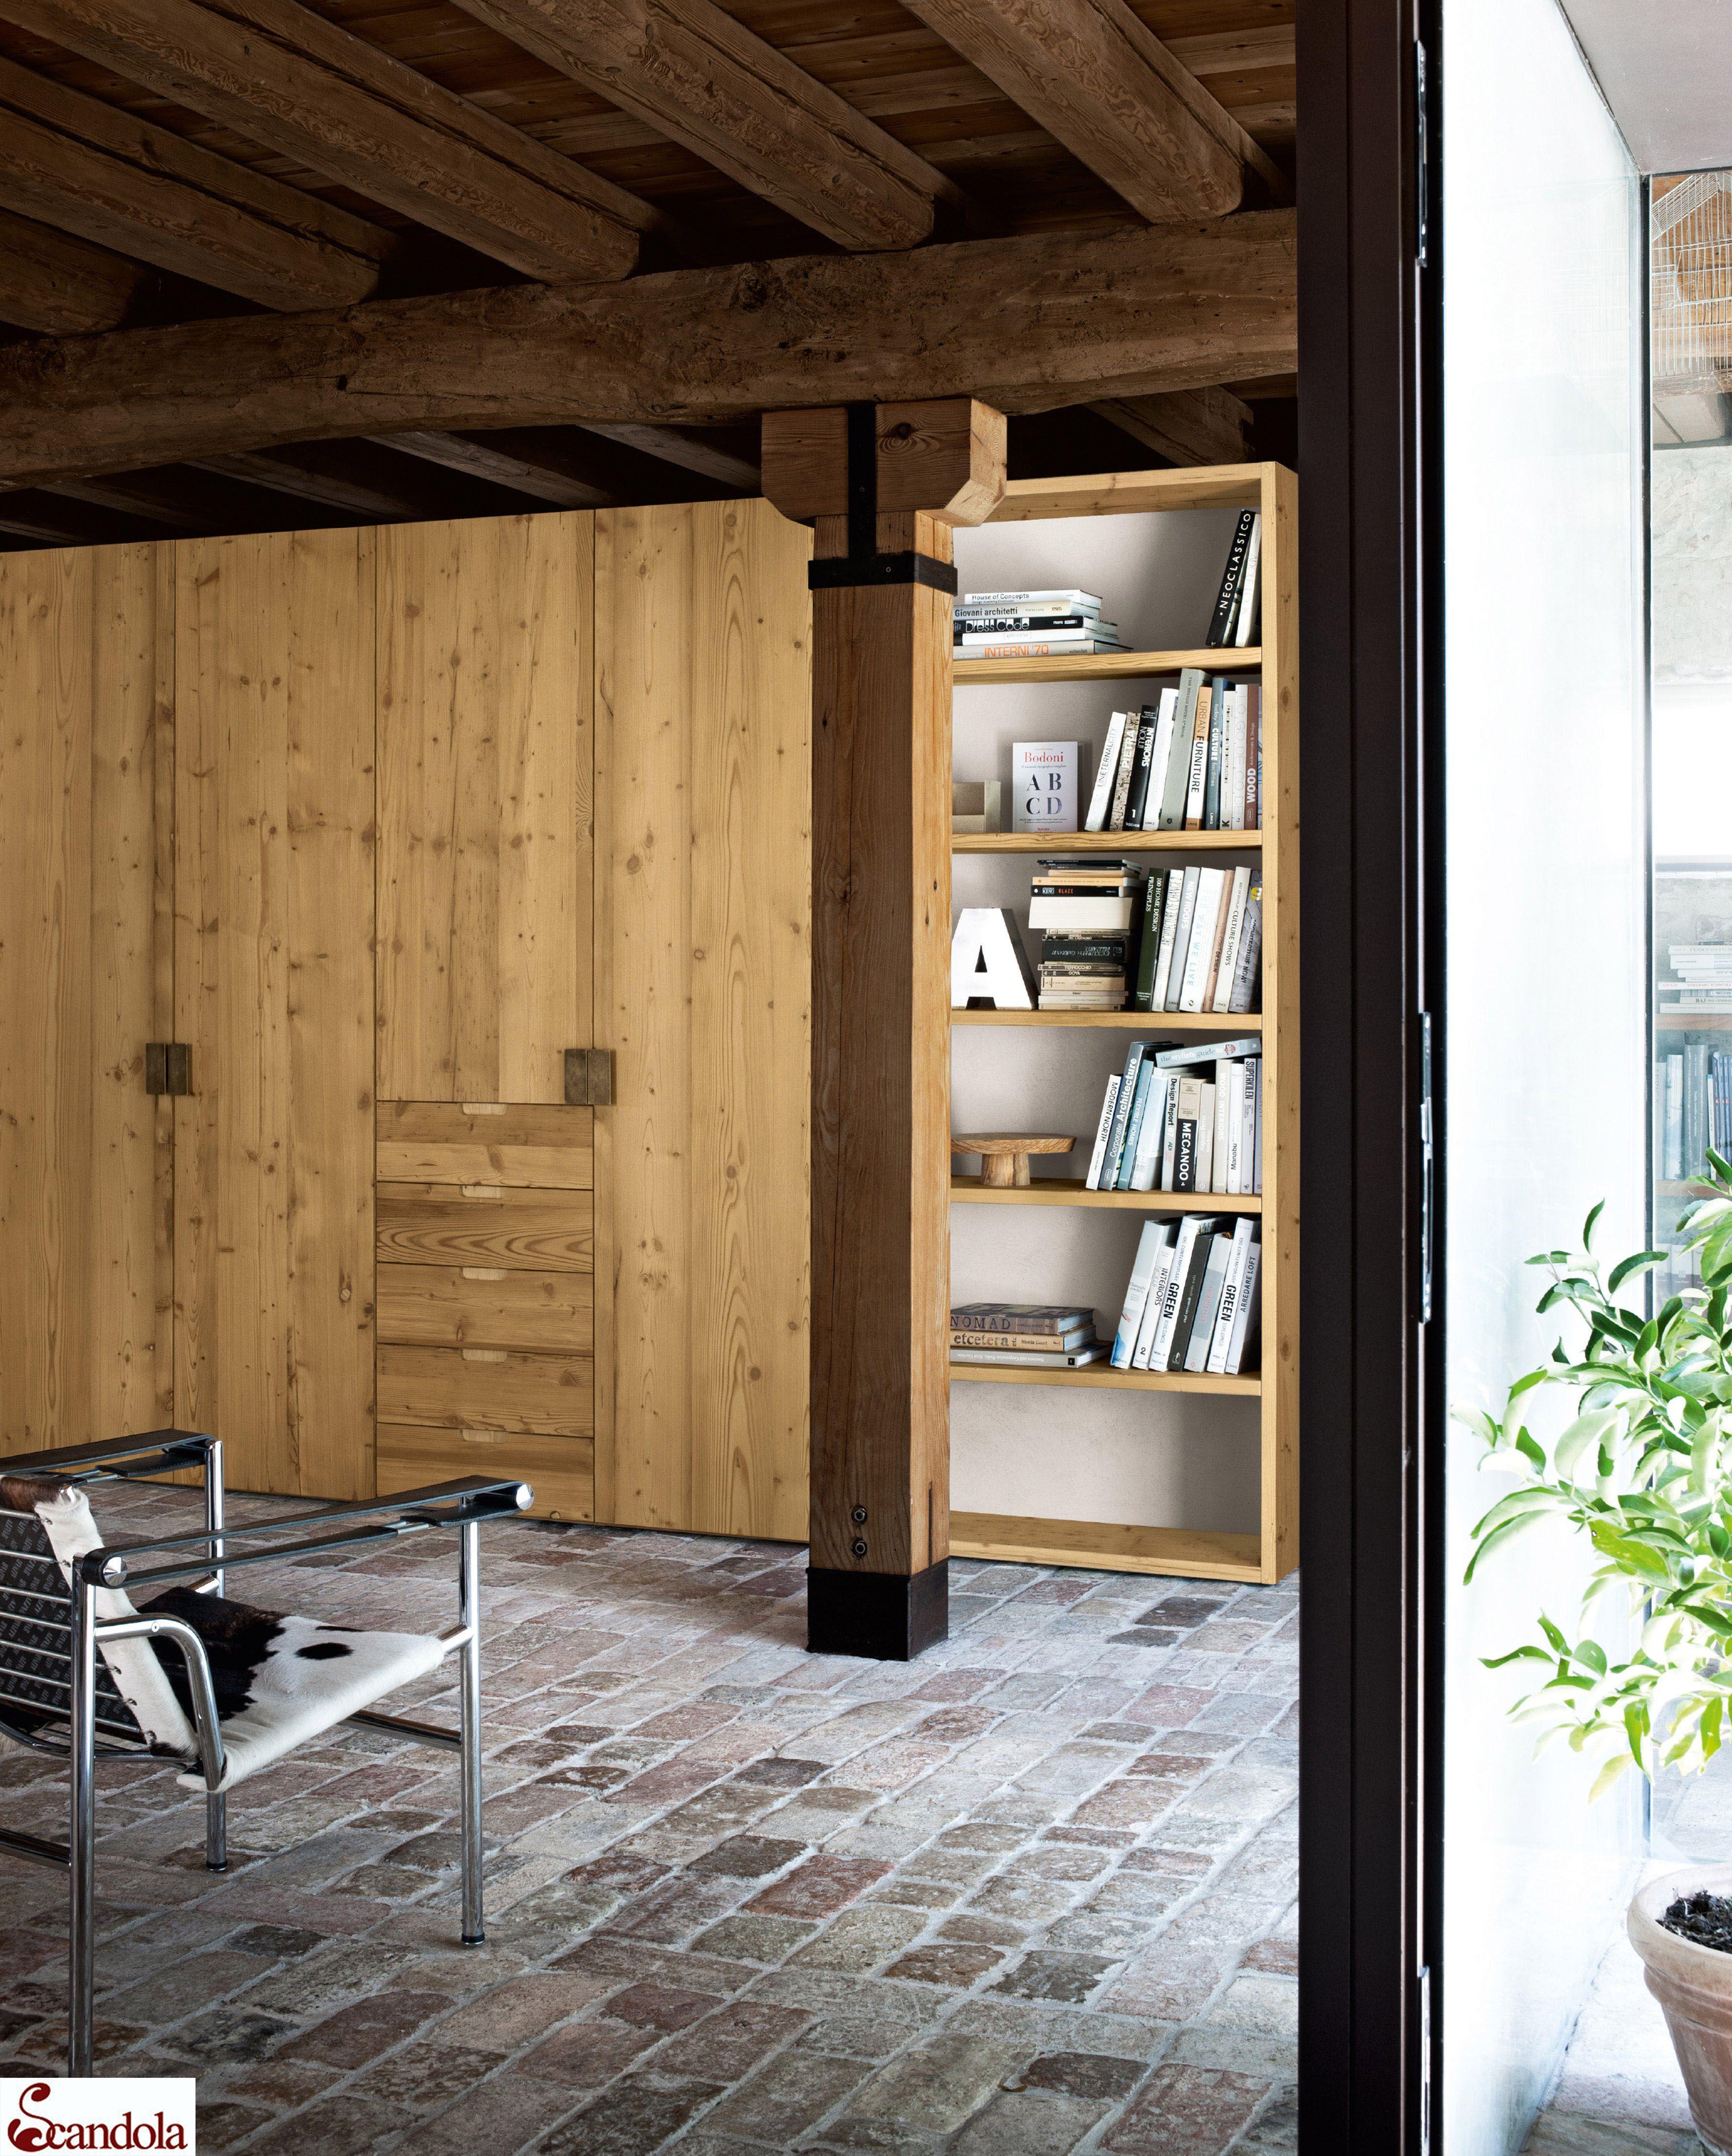 Armadio in legno vecchio / Old wood wardrobe. # ...